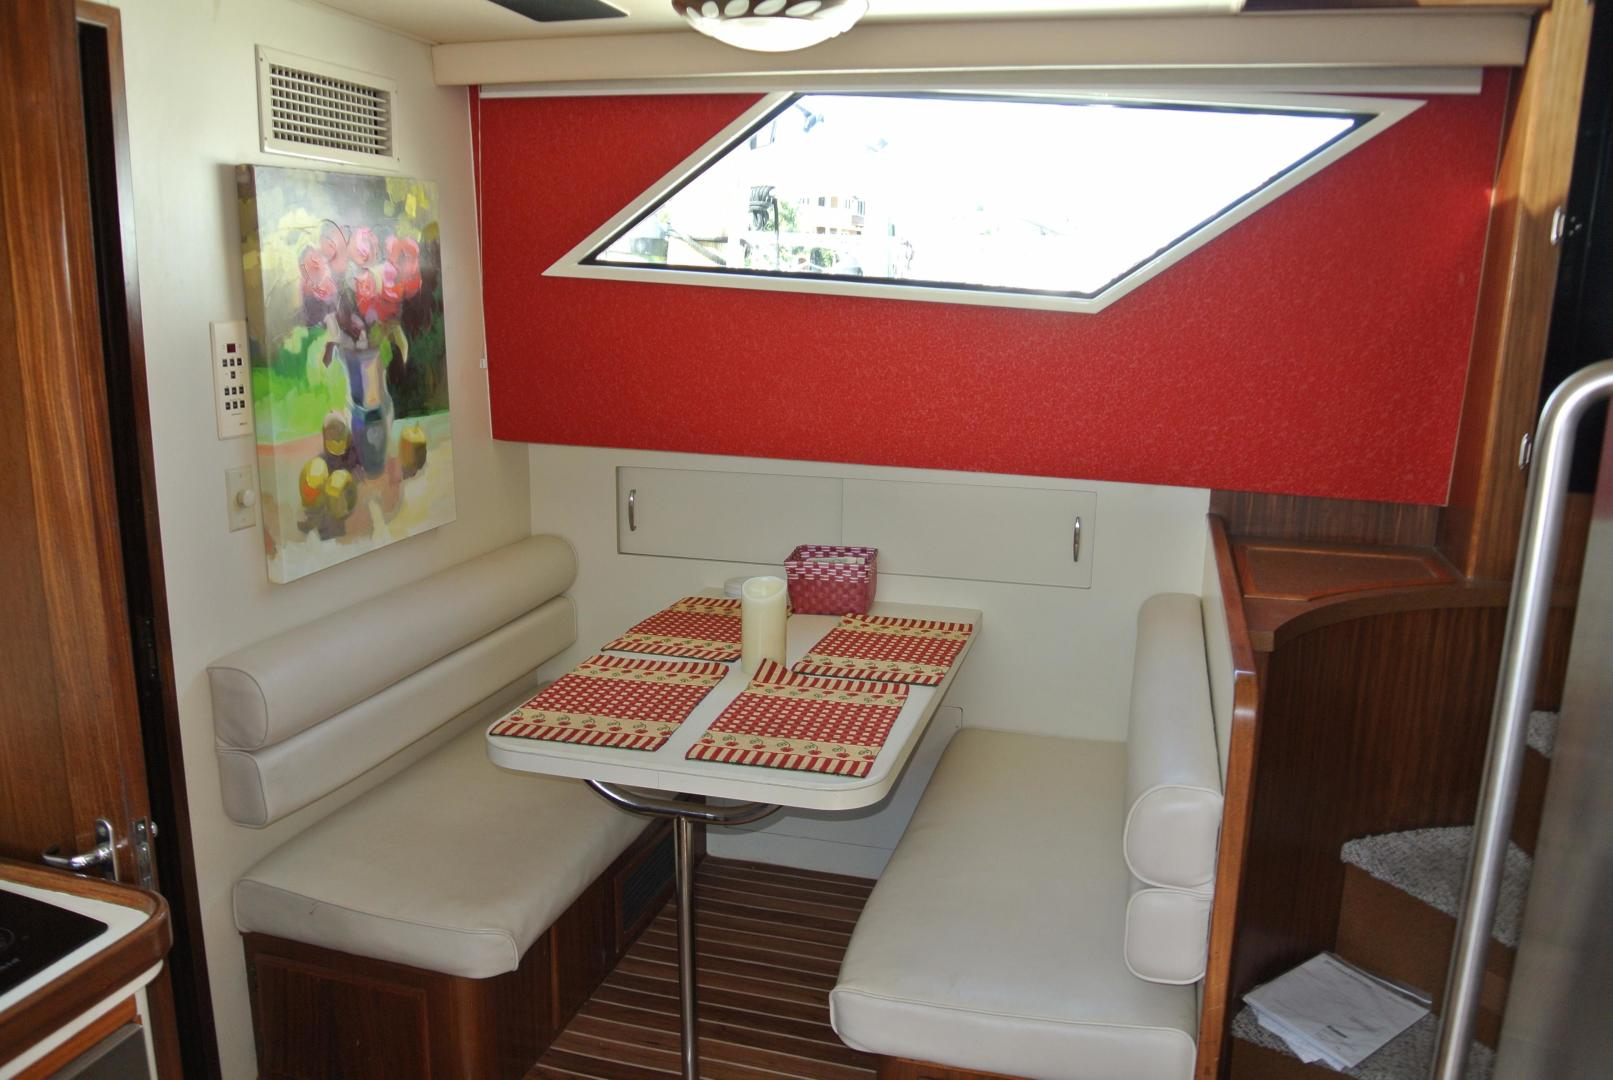 Hatteras-67-Cockpit-Motor-Yacht-1988-Lady-Encore-Saint-Petersburg-Florida-United-States-Dinette-926195